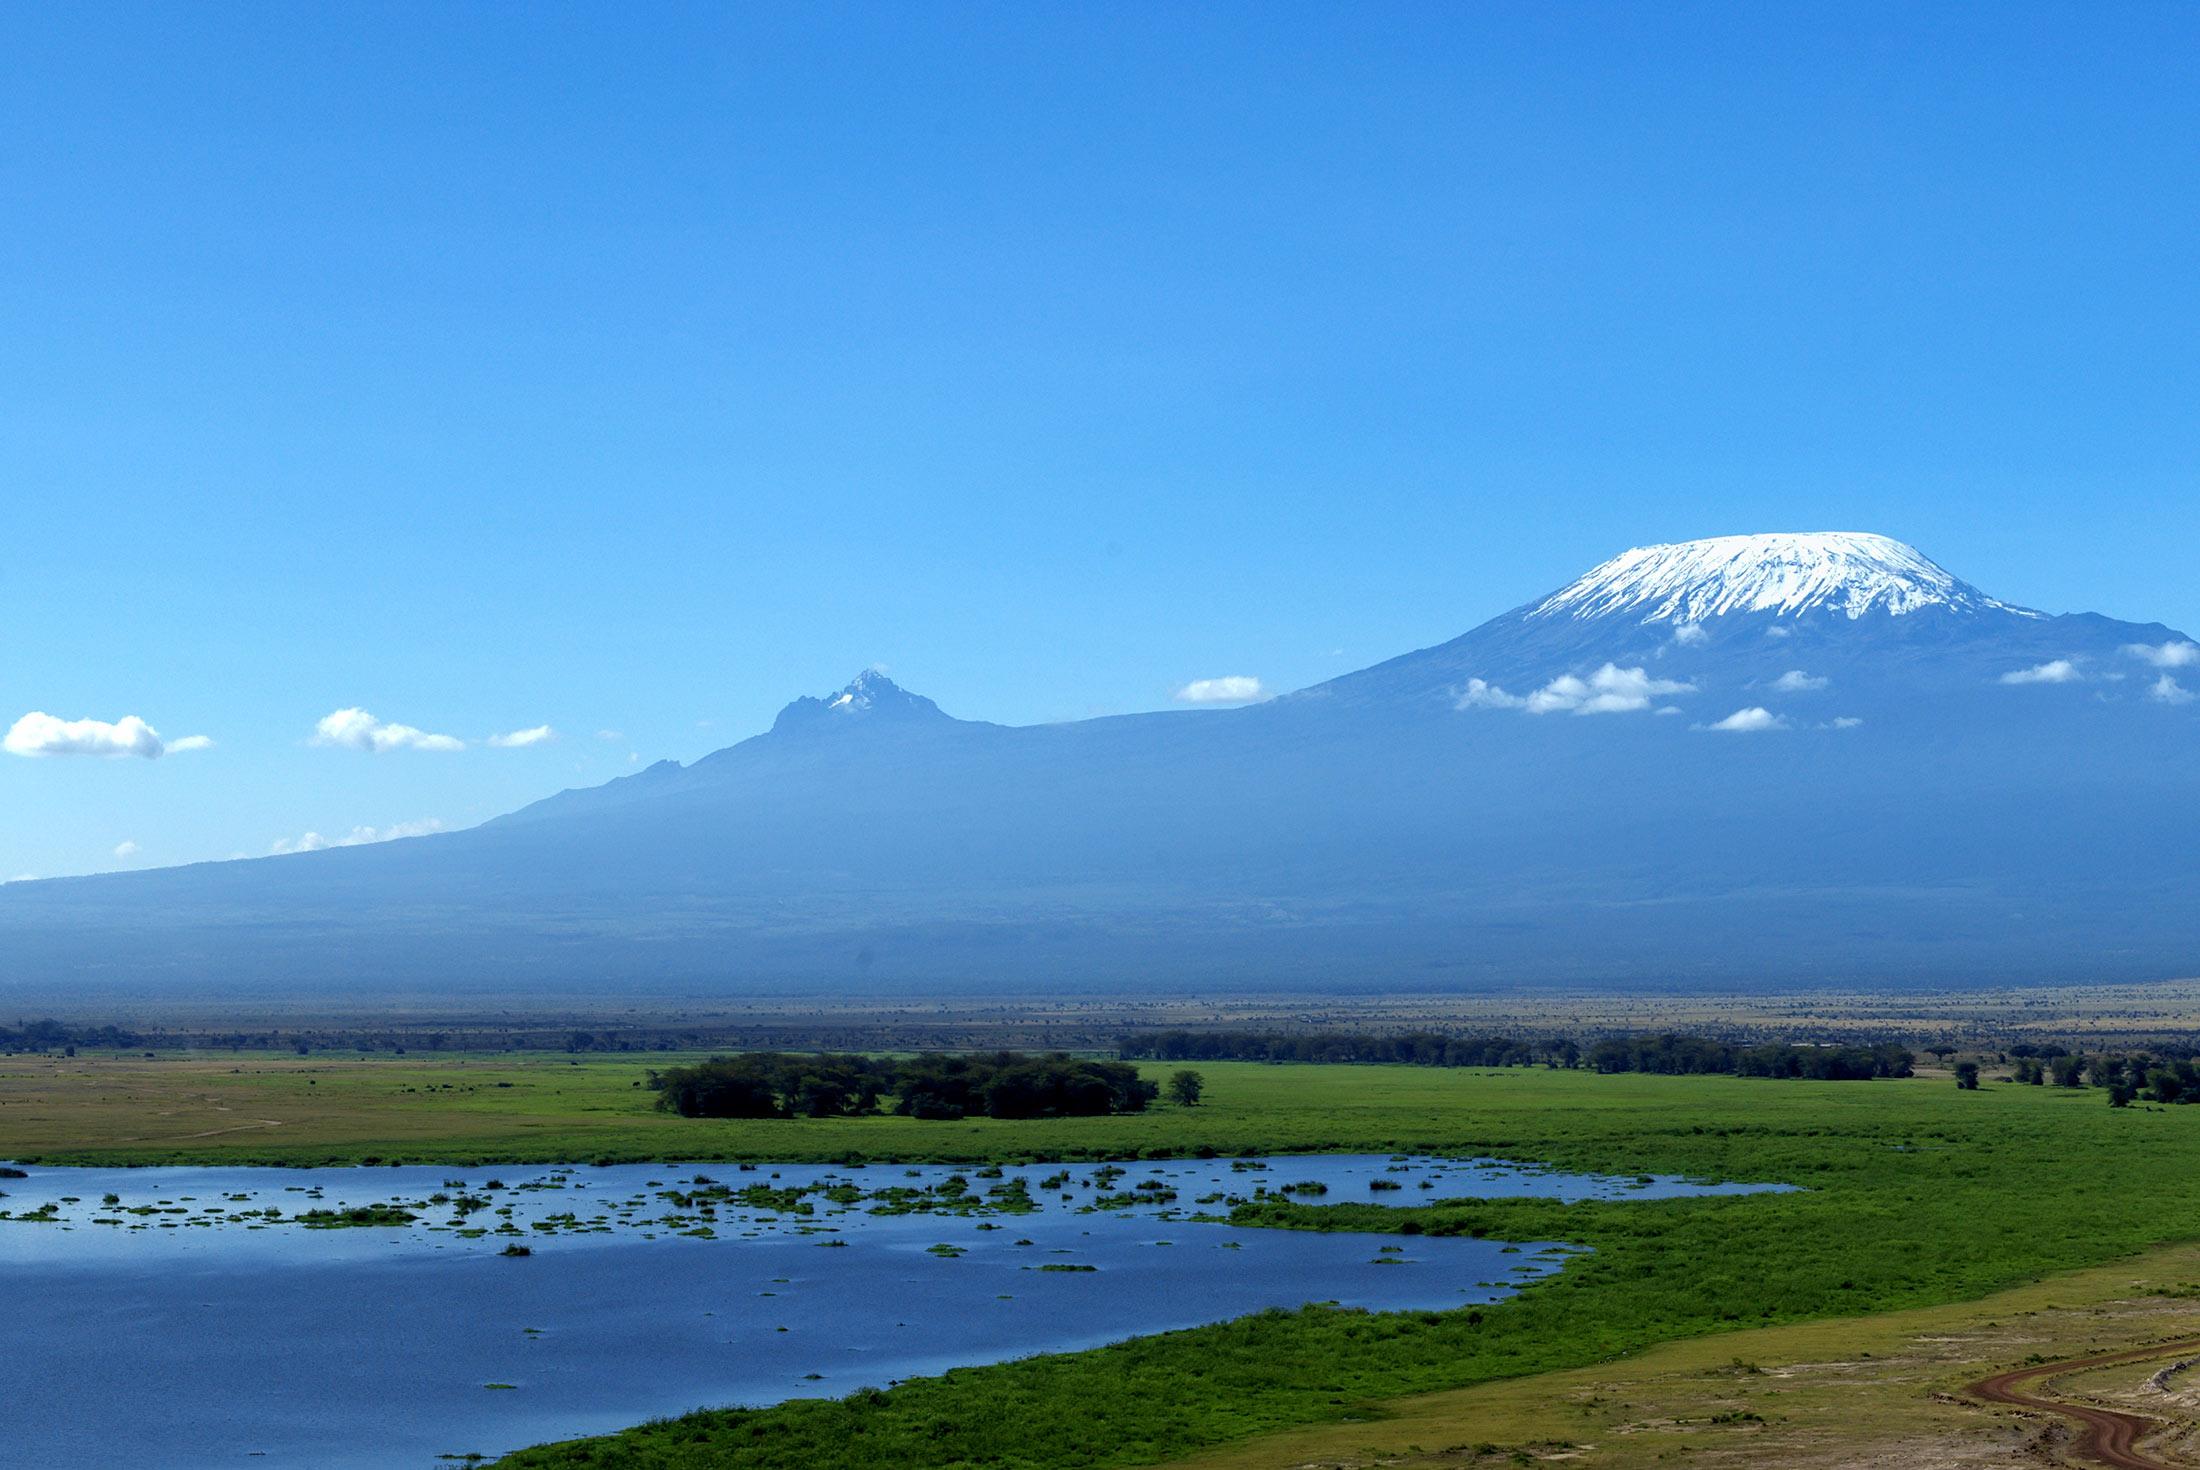 Mt Kilimanjaro Climb - Marangu Route 4